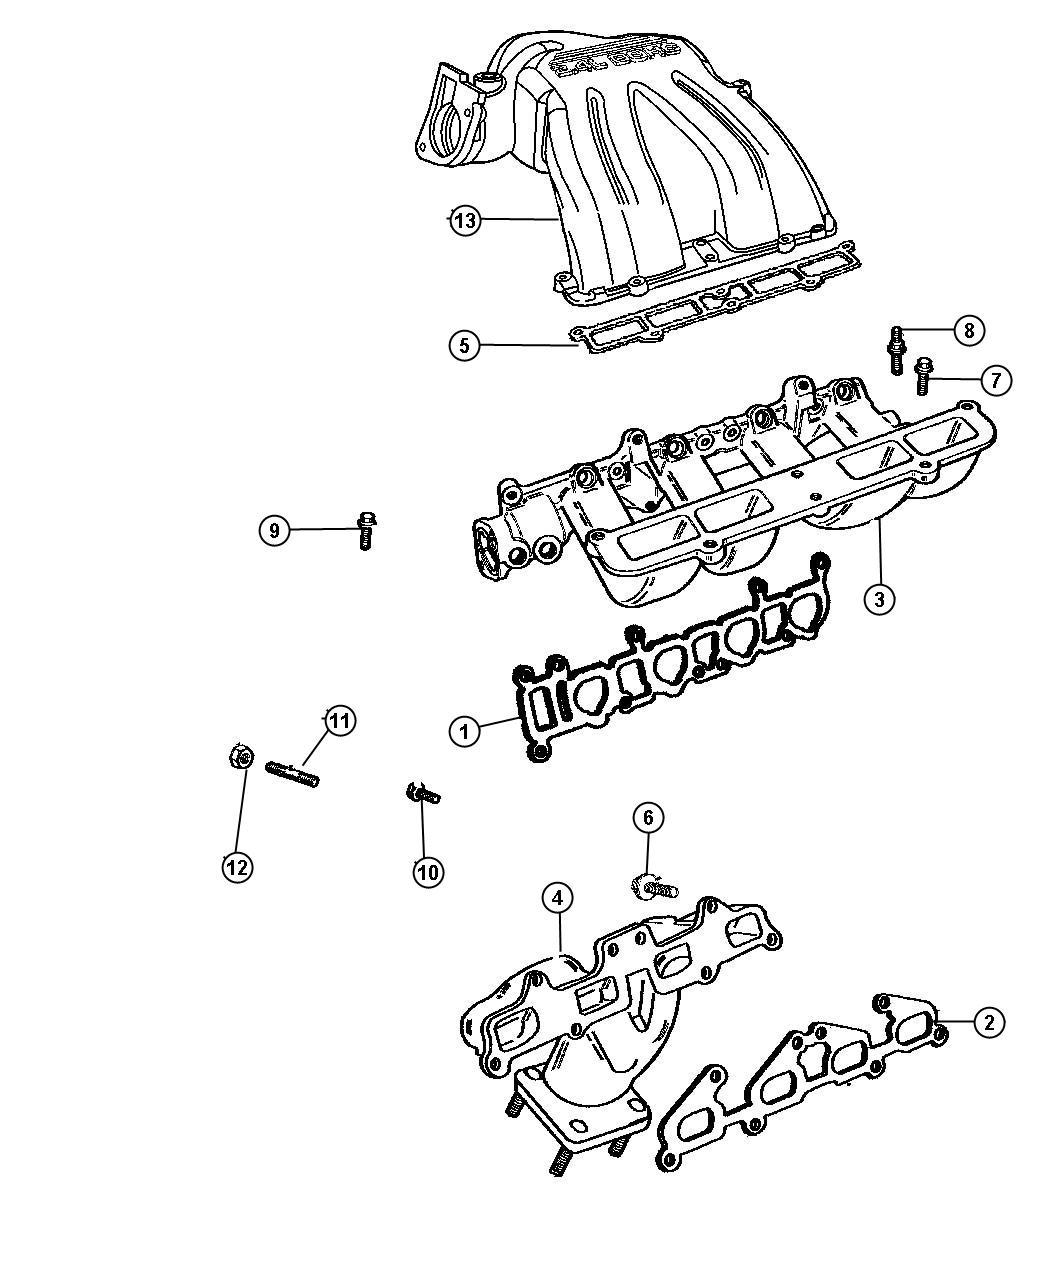 Dodge Caravan Manifolds Intake And Exhaust 2 4l Edz